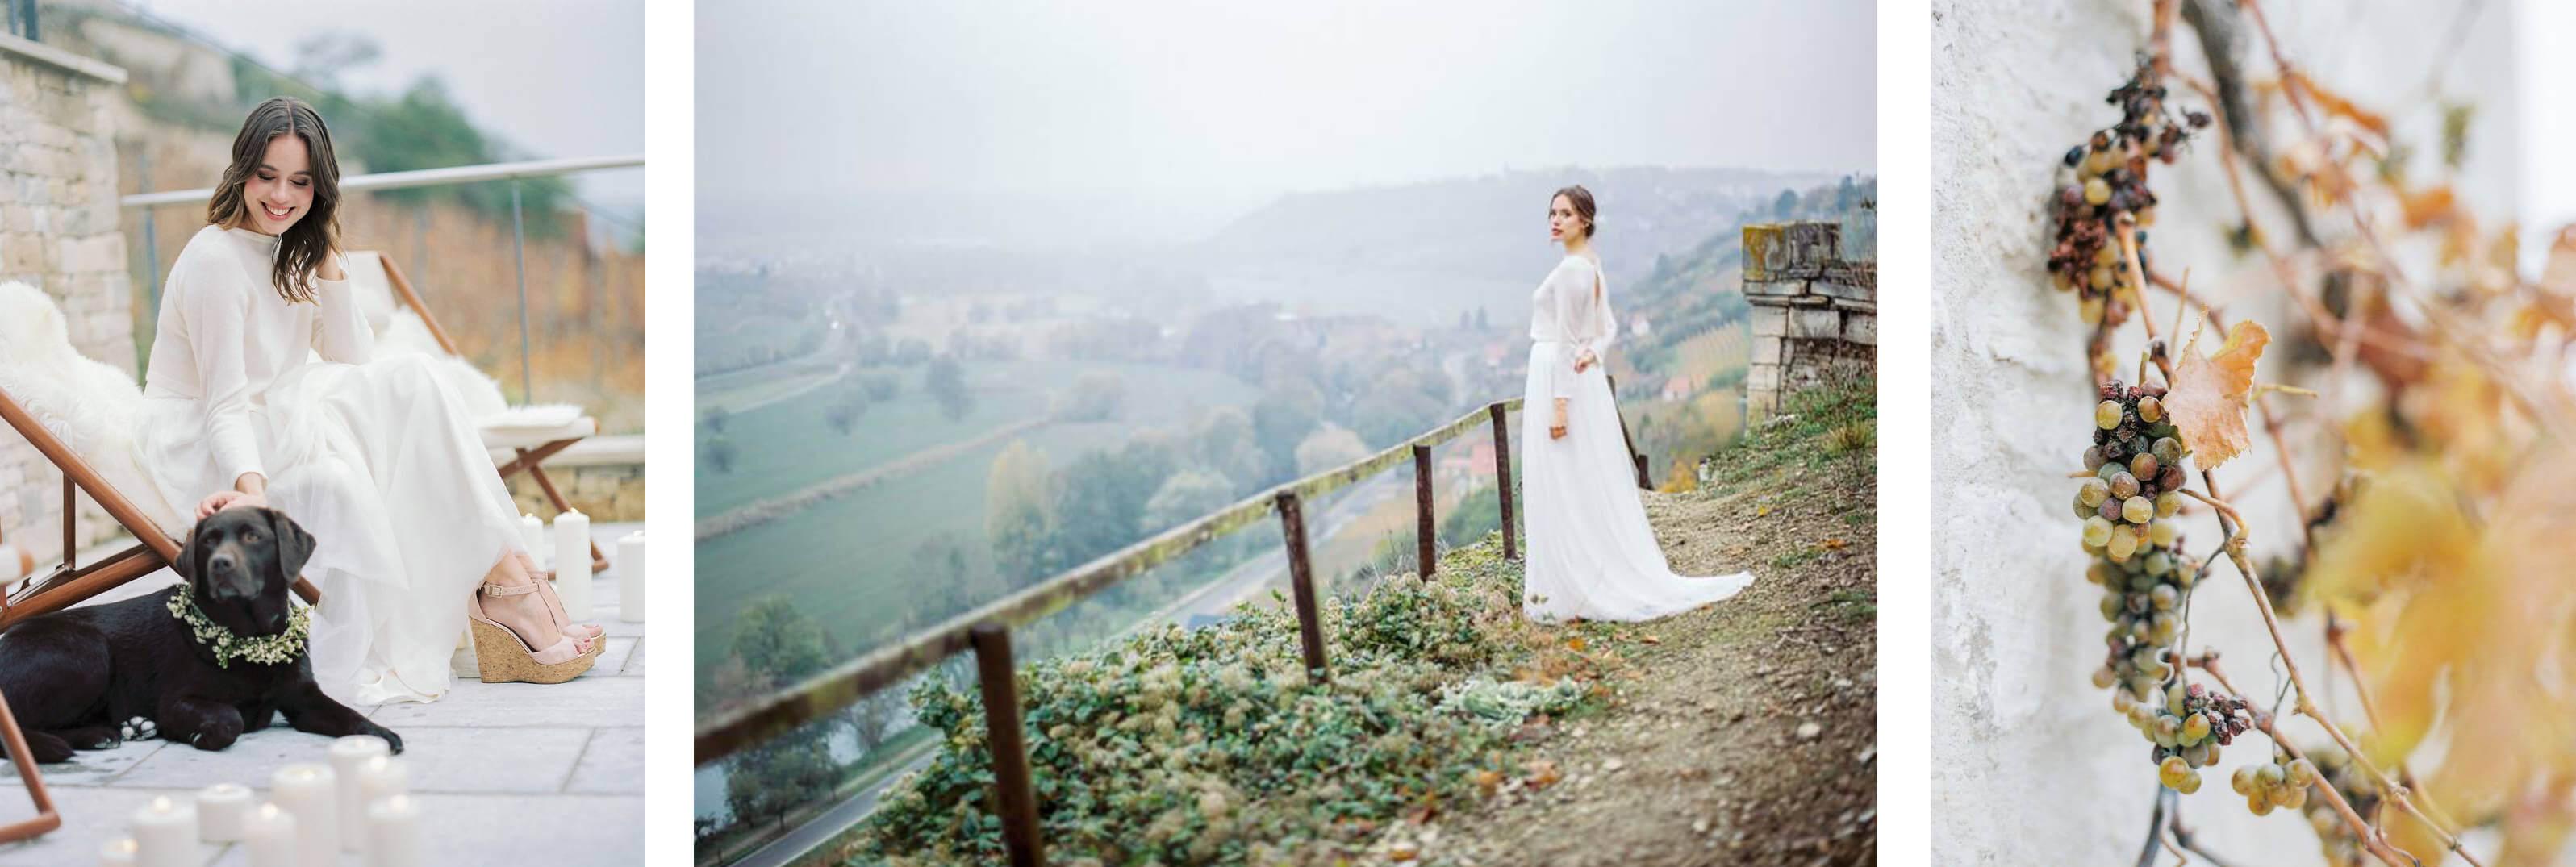 Papeterie Hochzeit Berlin Jungrad